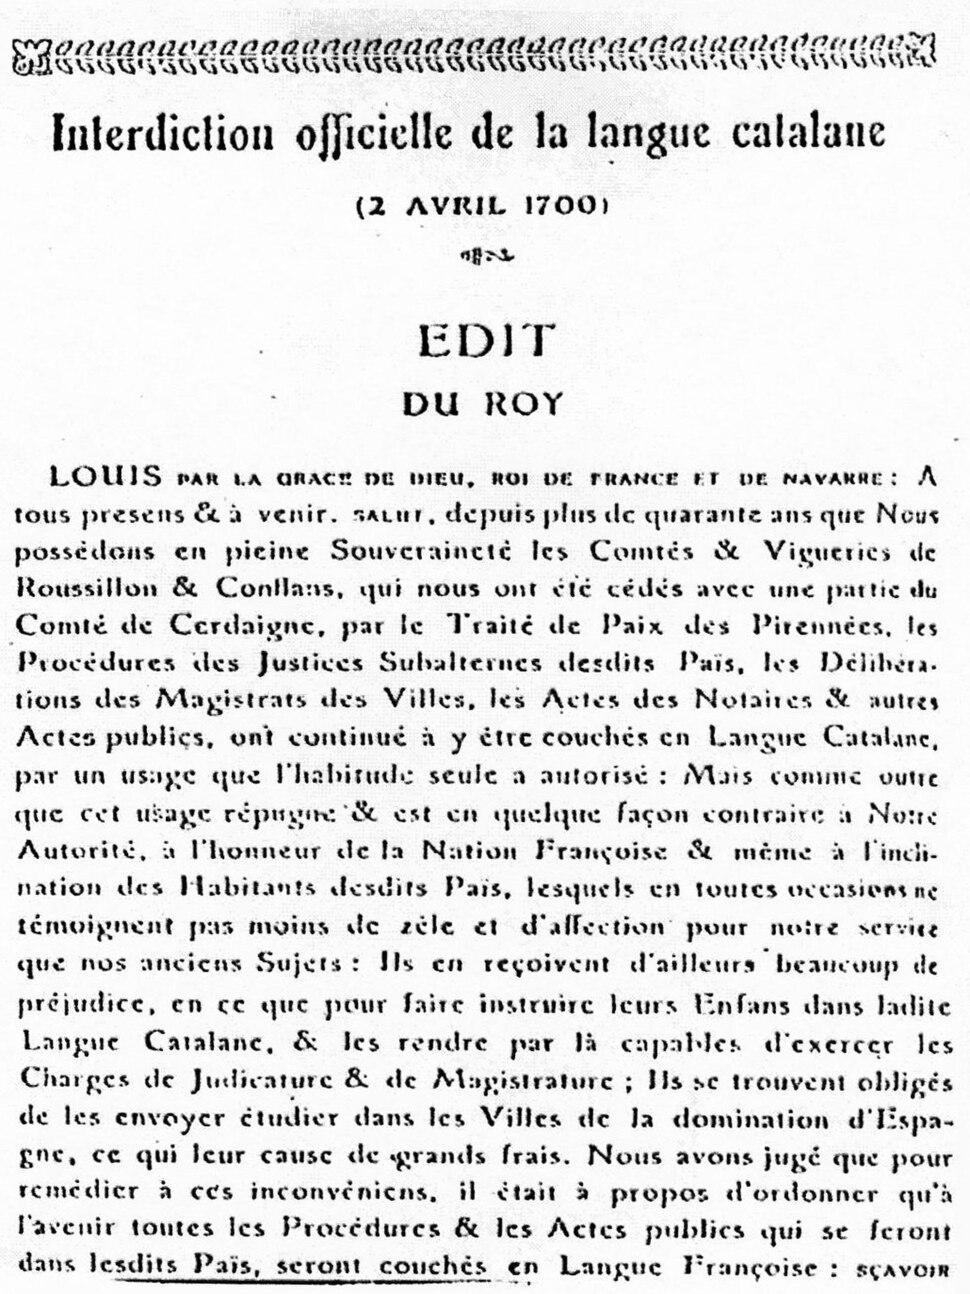 Interdiction officielle de la langue catalana 2 avril 1700